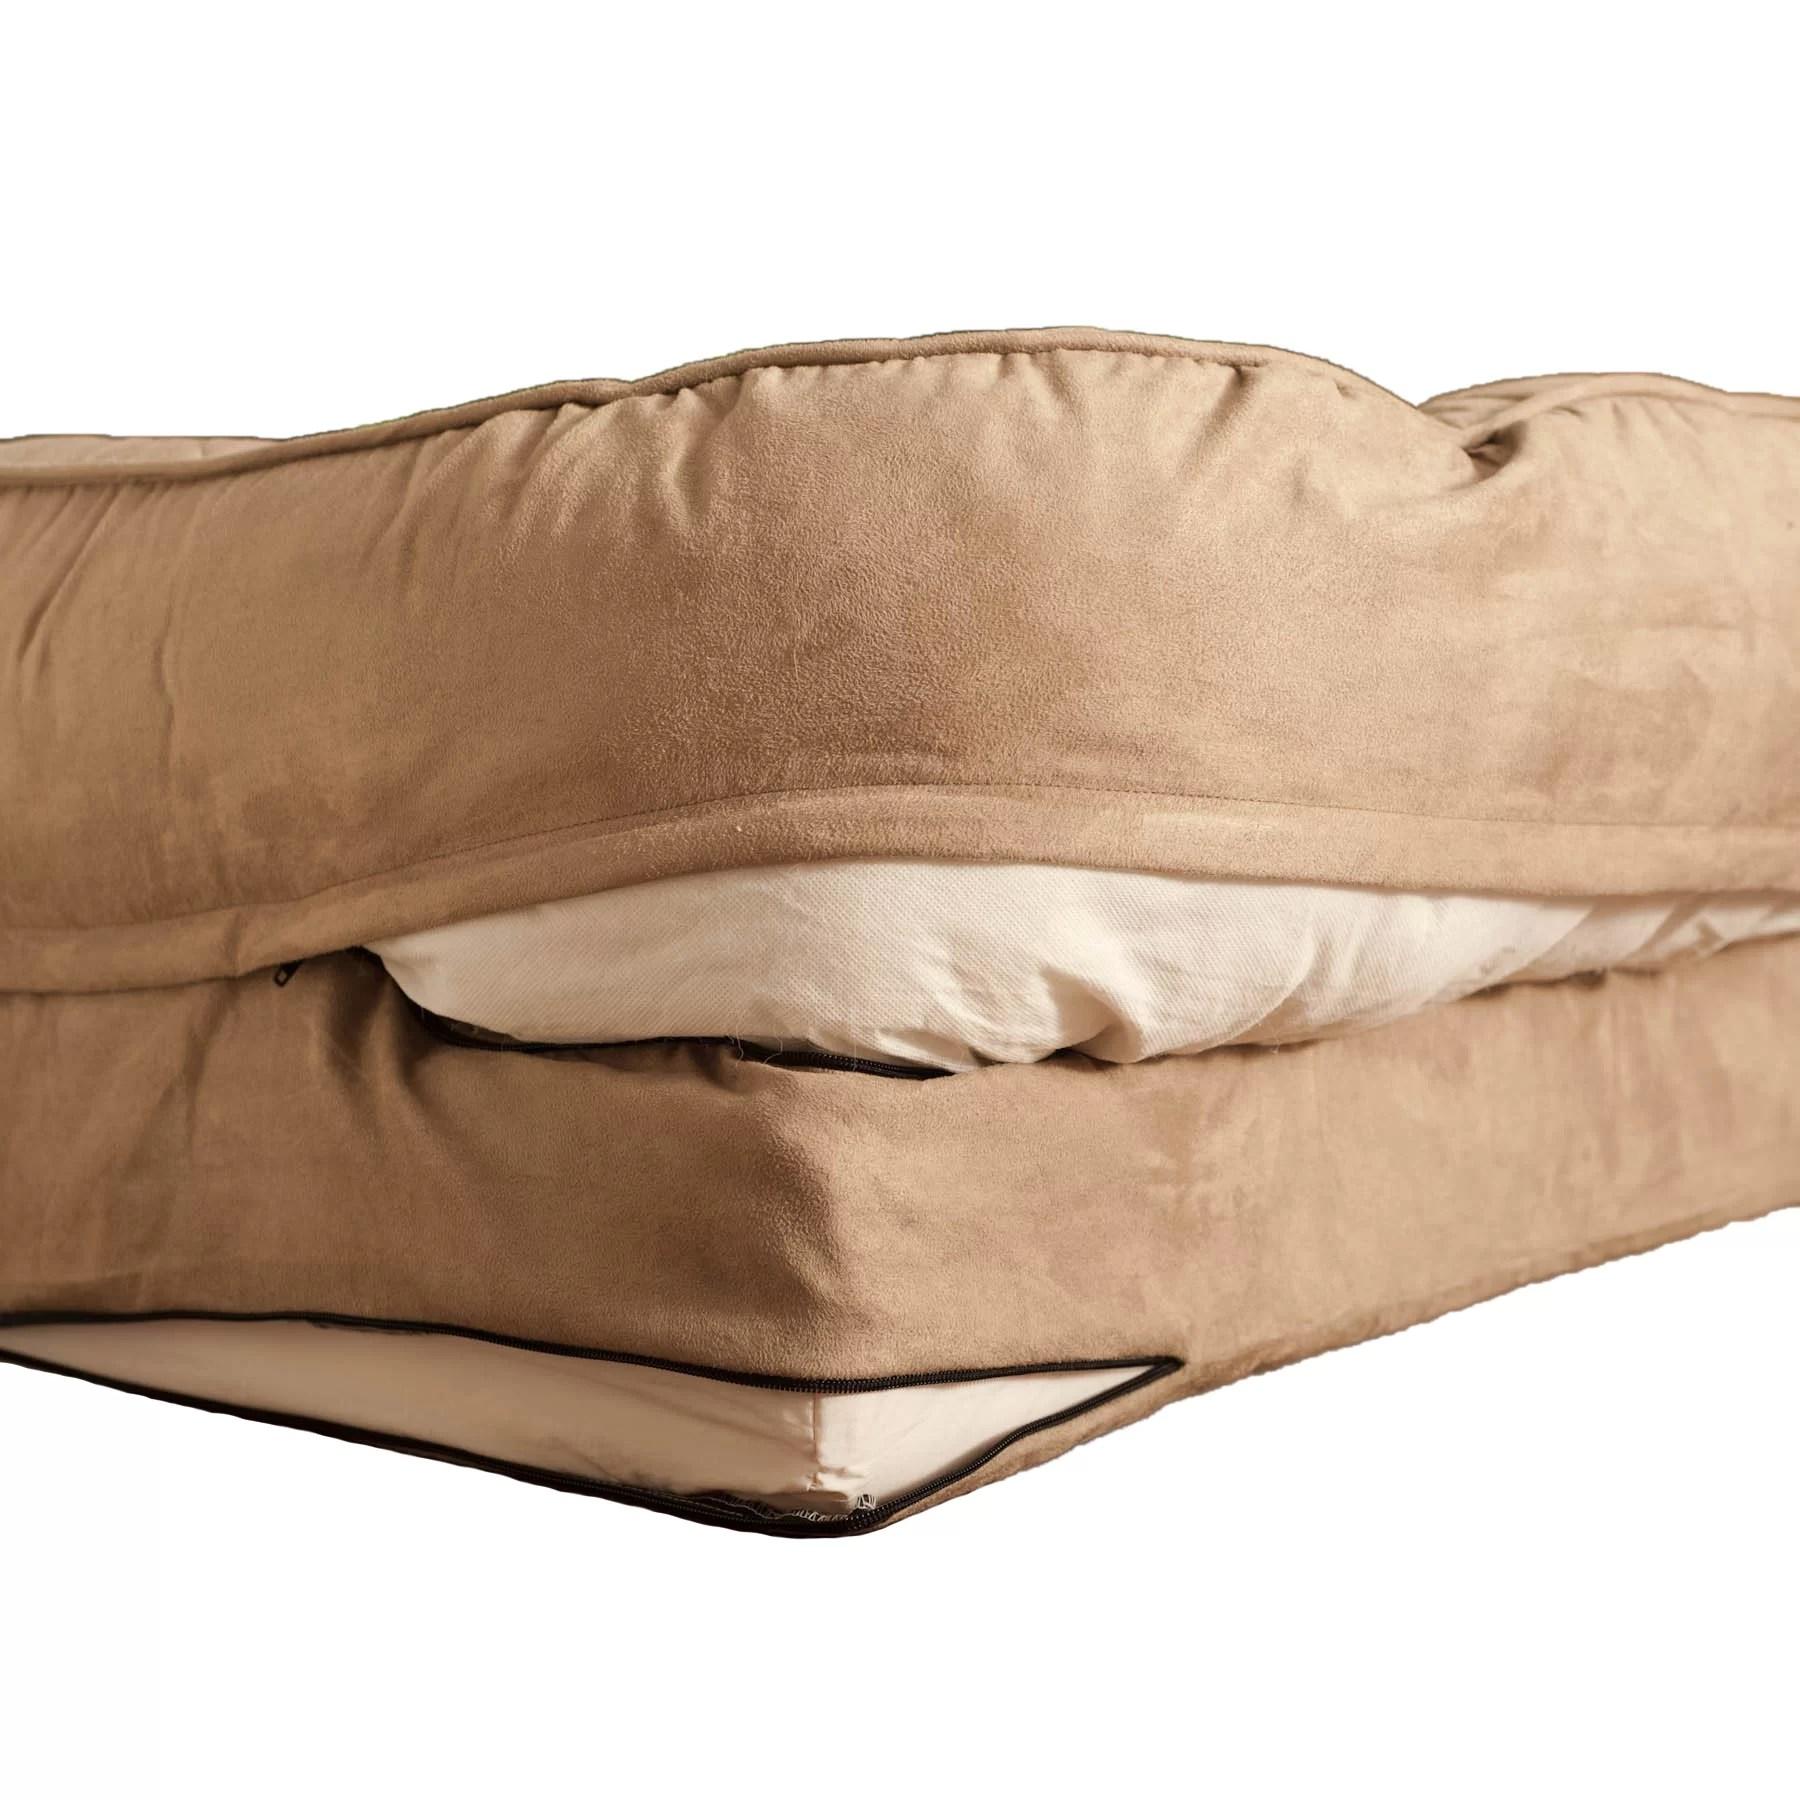 Buddy Beds Memory Foam Bolster Dog Bed